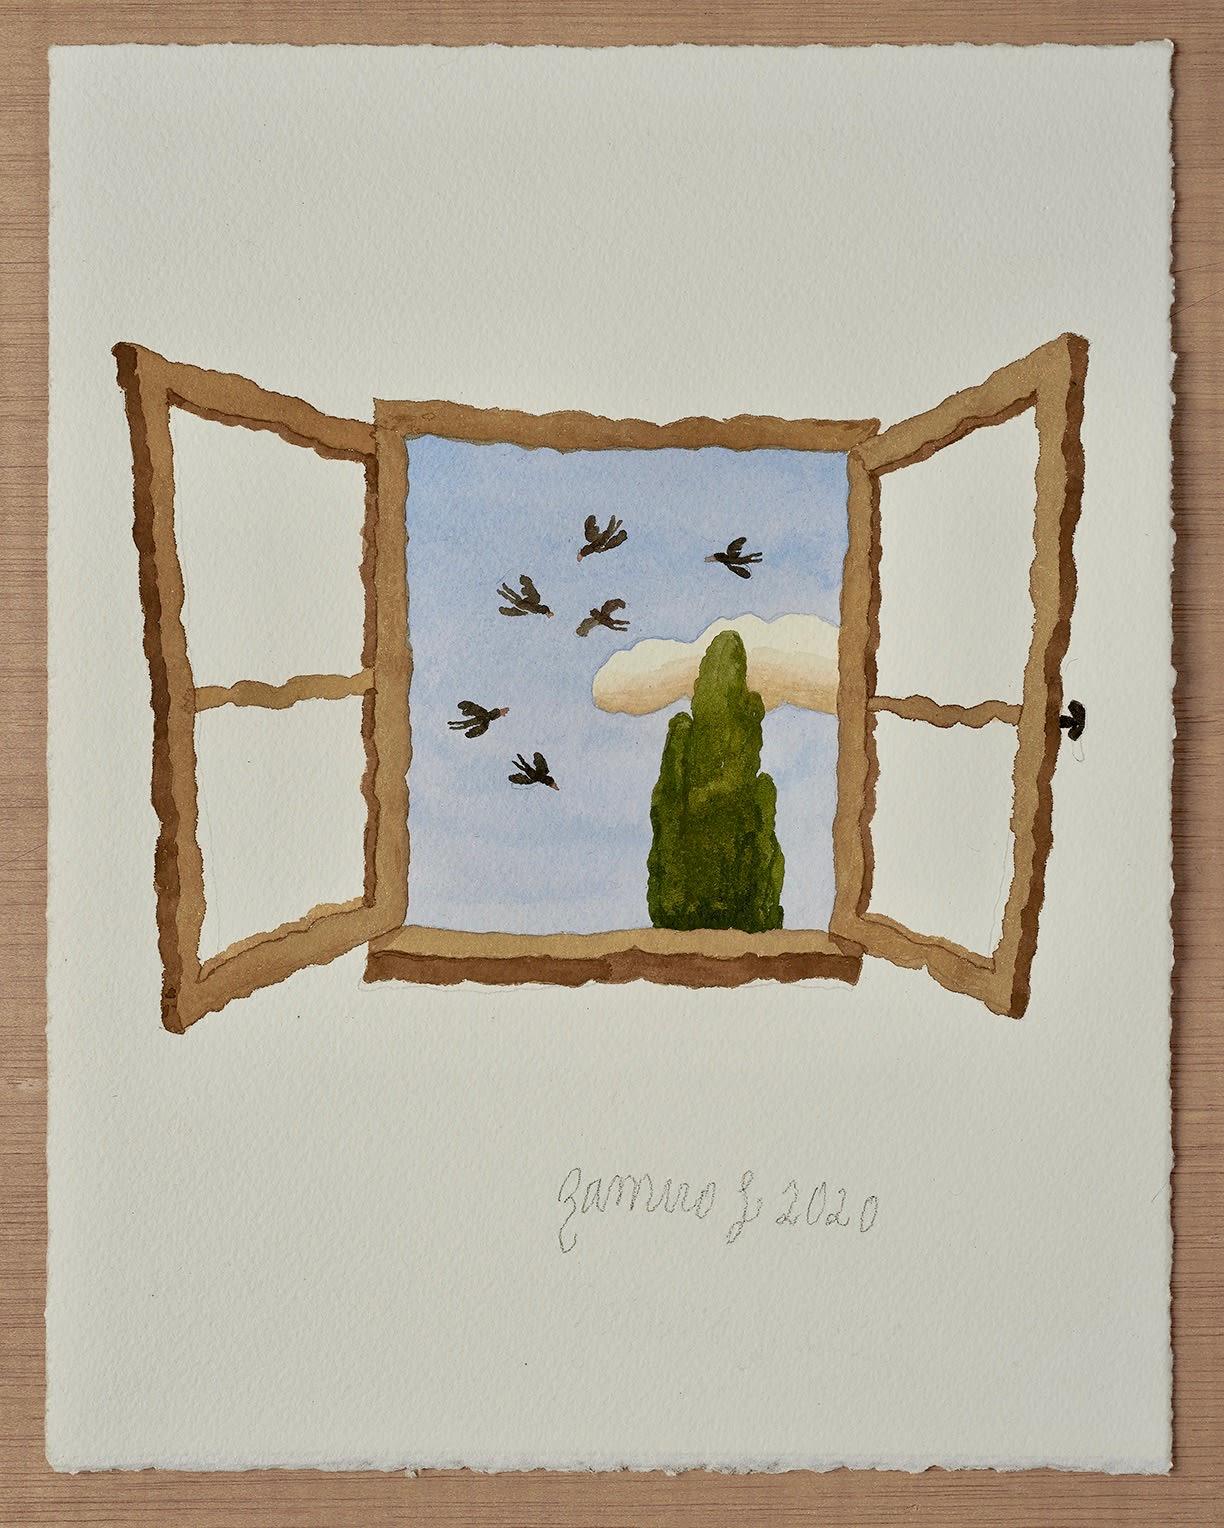 Ramiro Fernandez Saus, Open Window, 2020